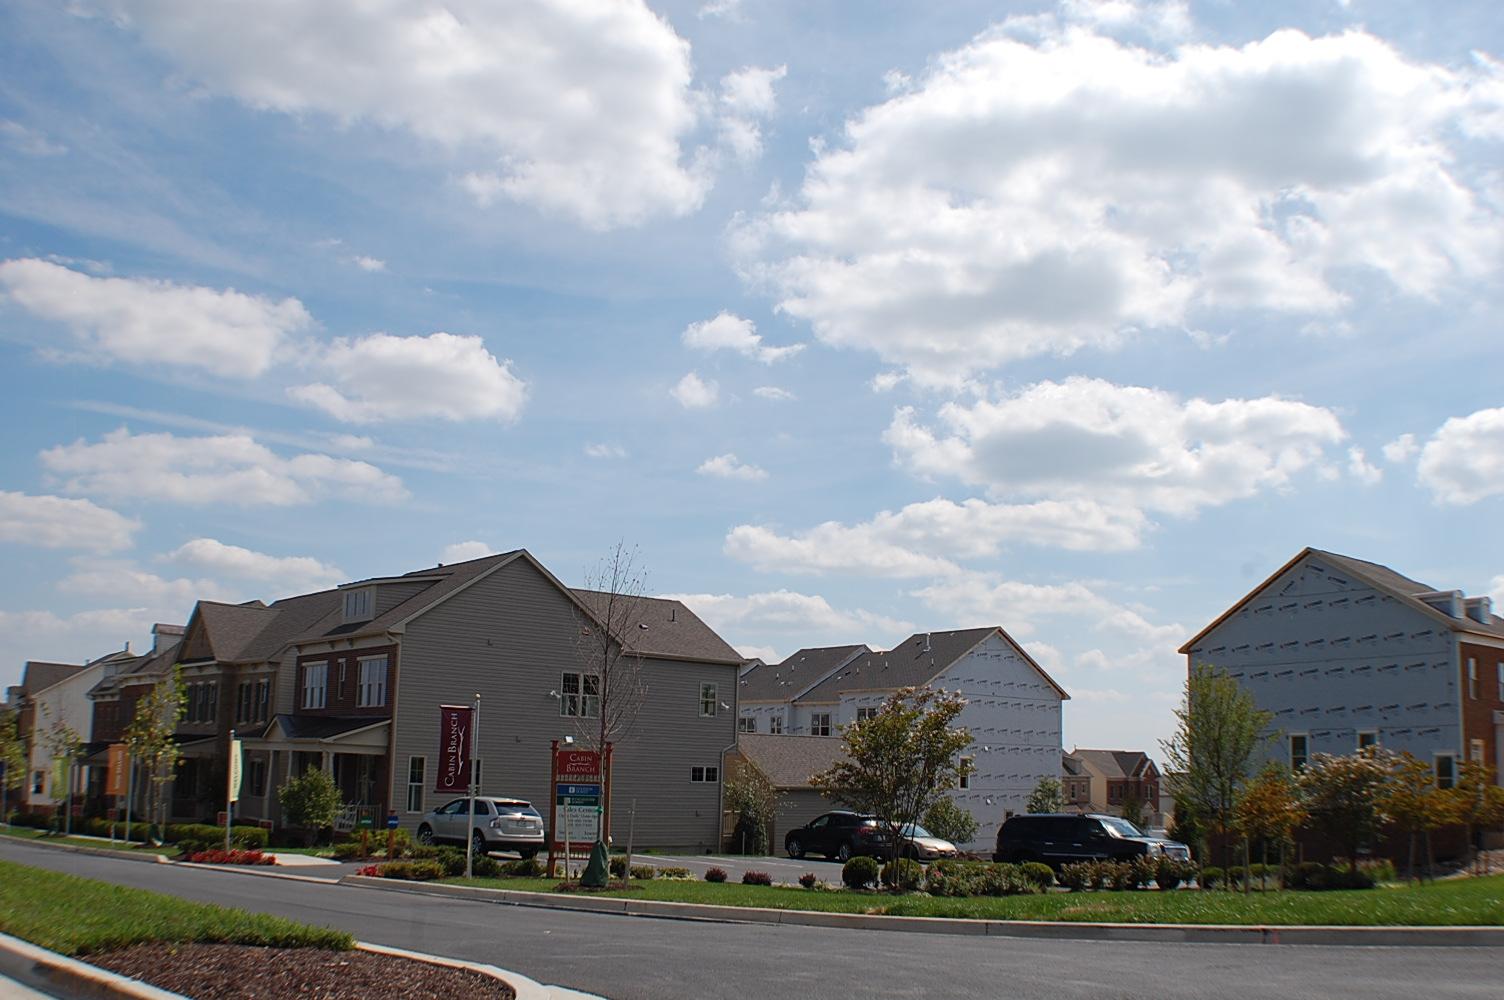 Cabin branch boyds clarksburg new homes for sale next to for Cabin branch clarksburg md